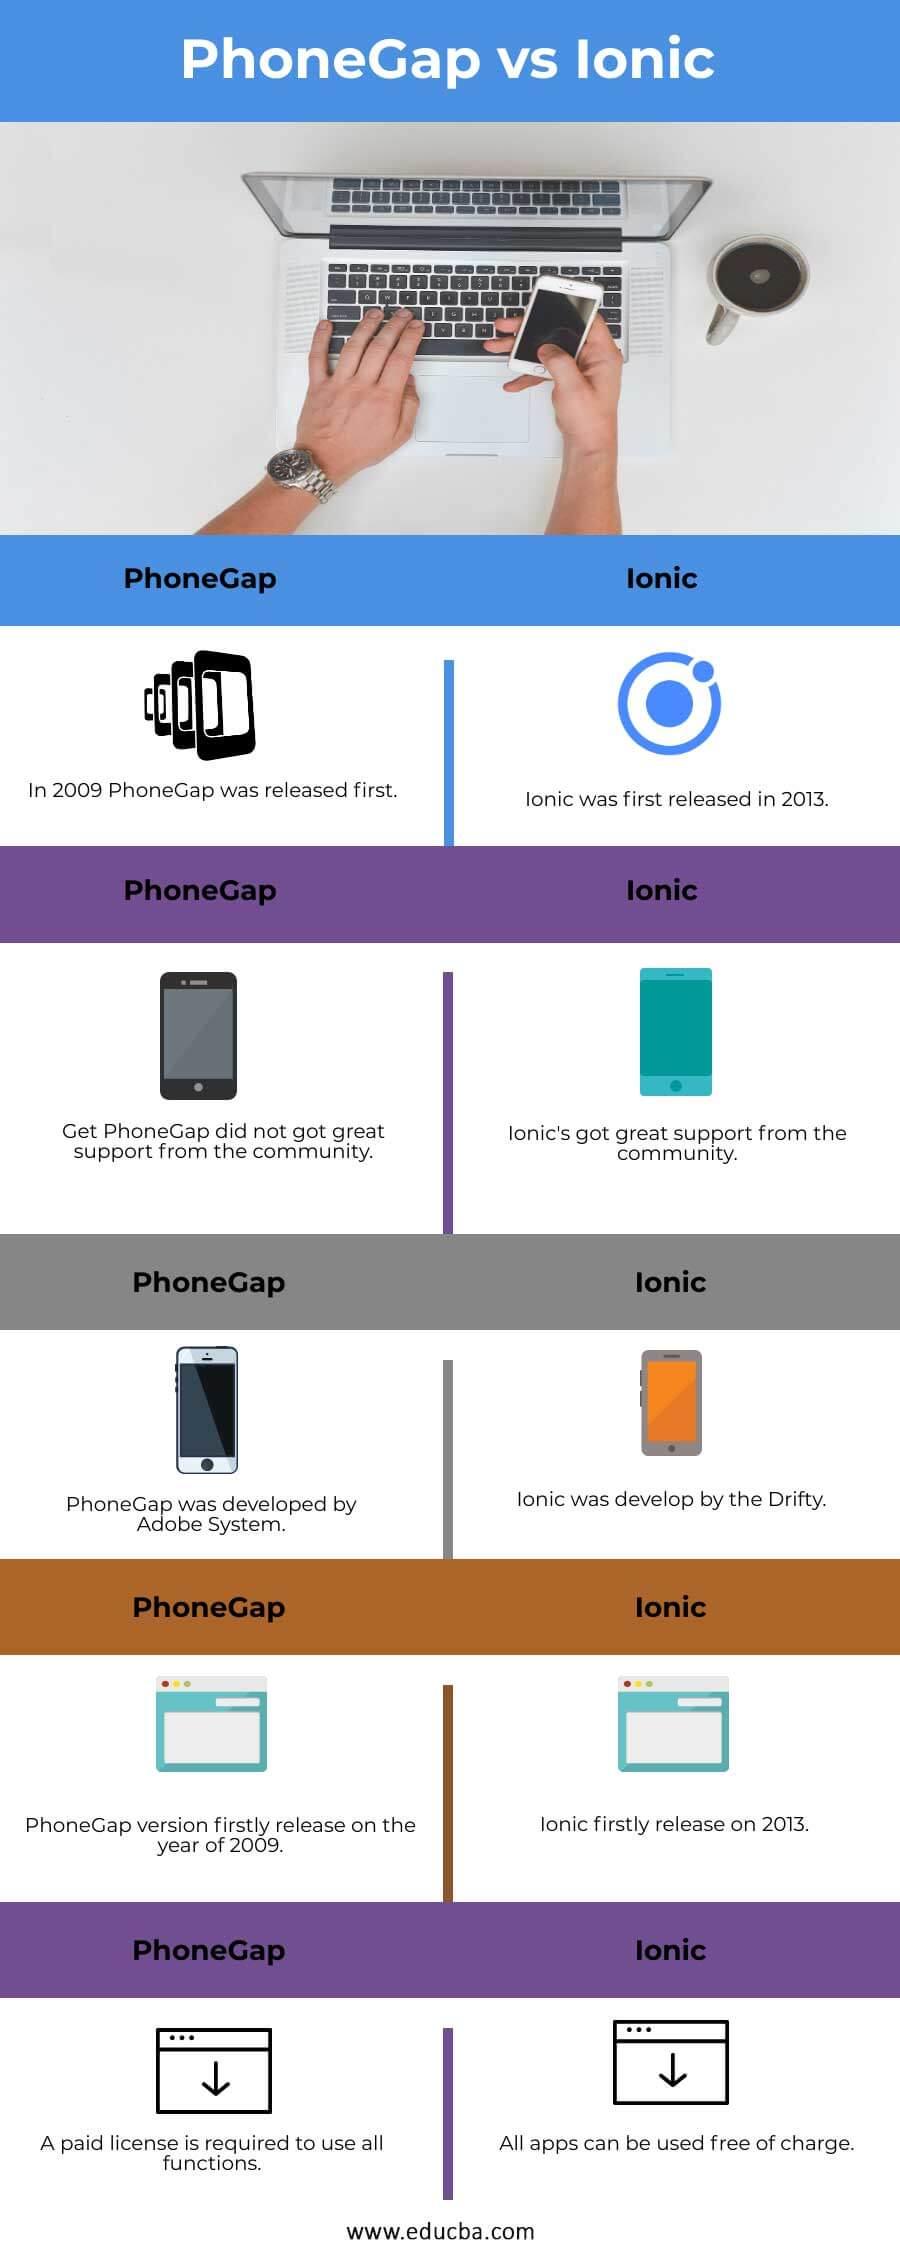 PhoneGap vs Ionic